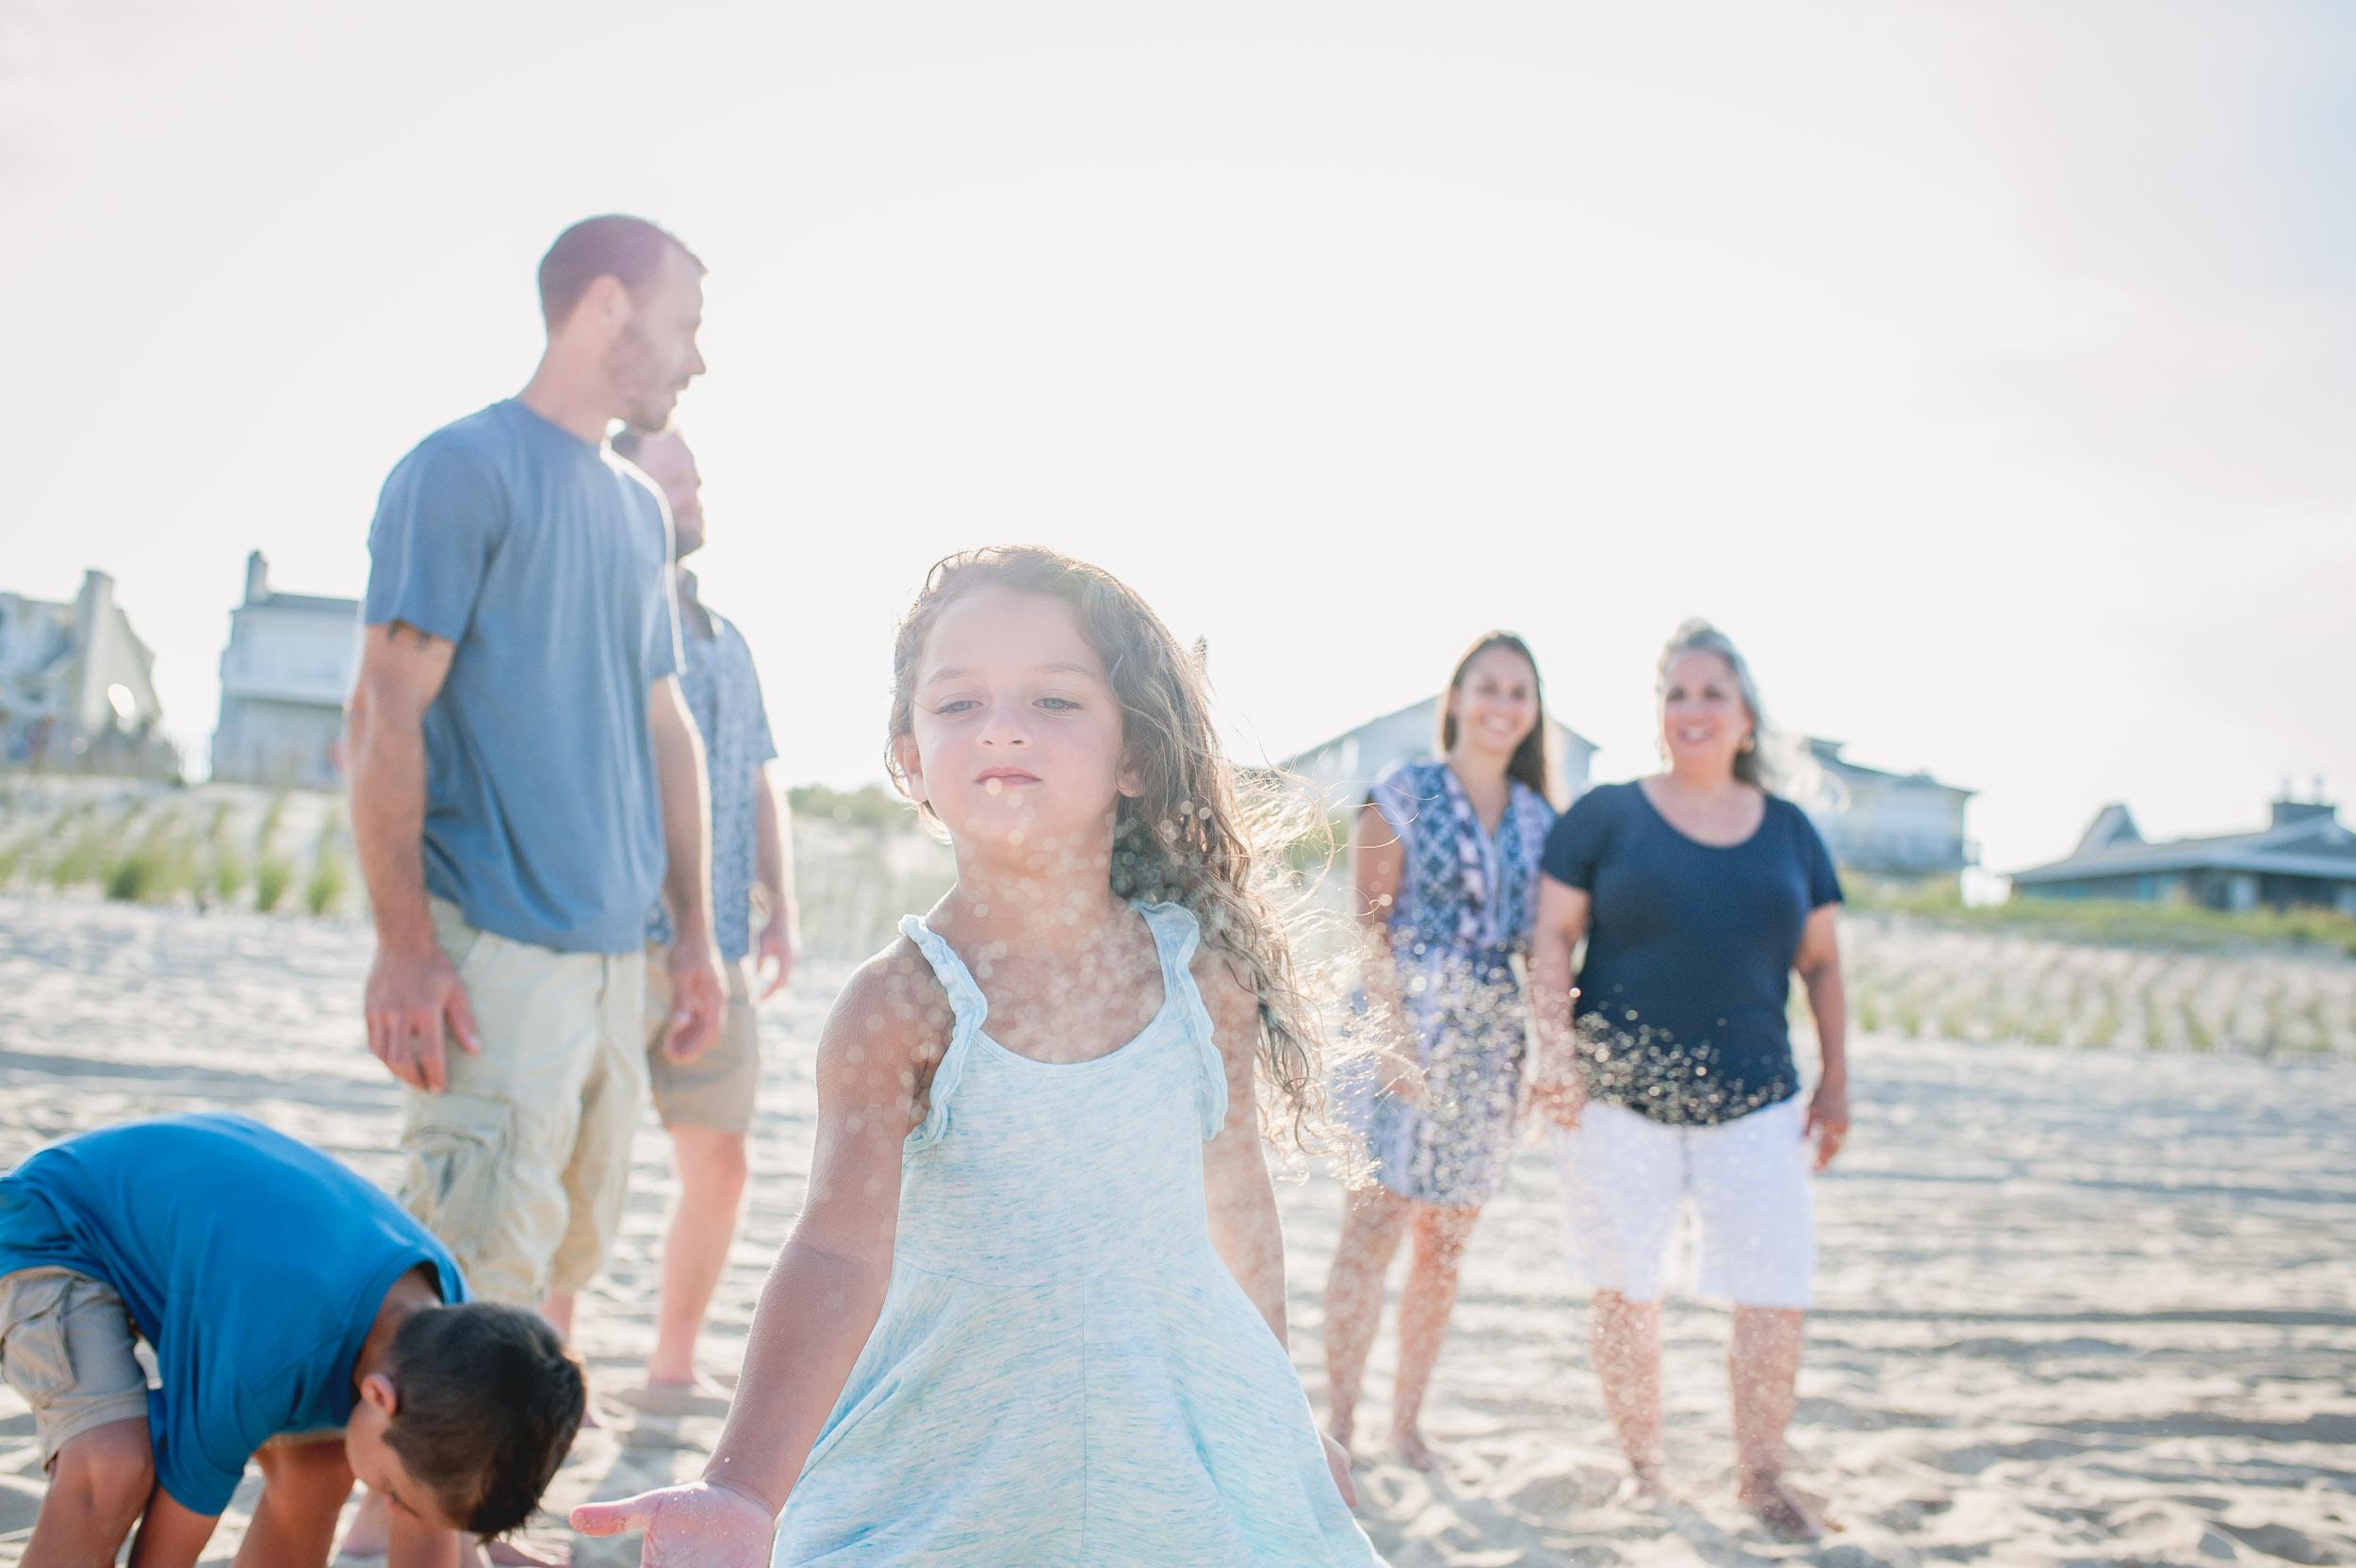 Olga_Family_Photo_Session_Maryland_Ocean_City_Eastern_Shore(2of12).jpg